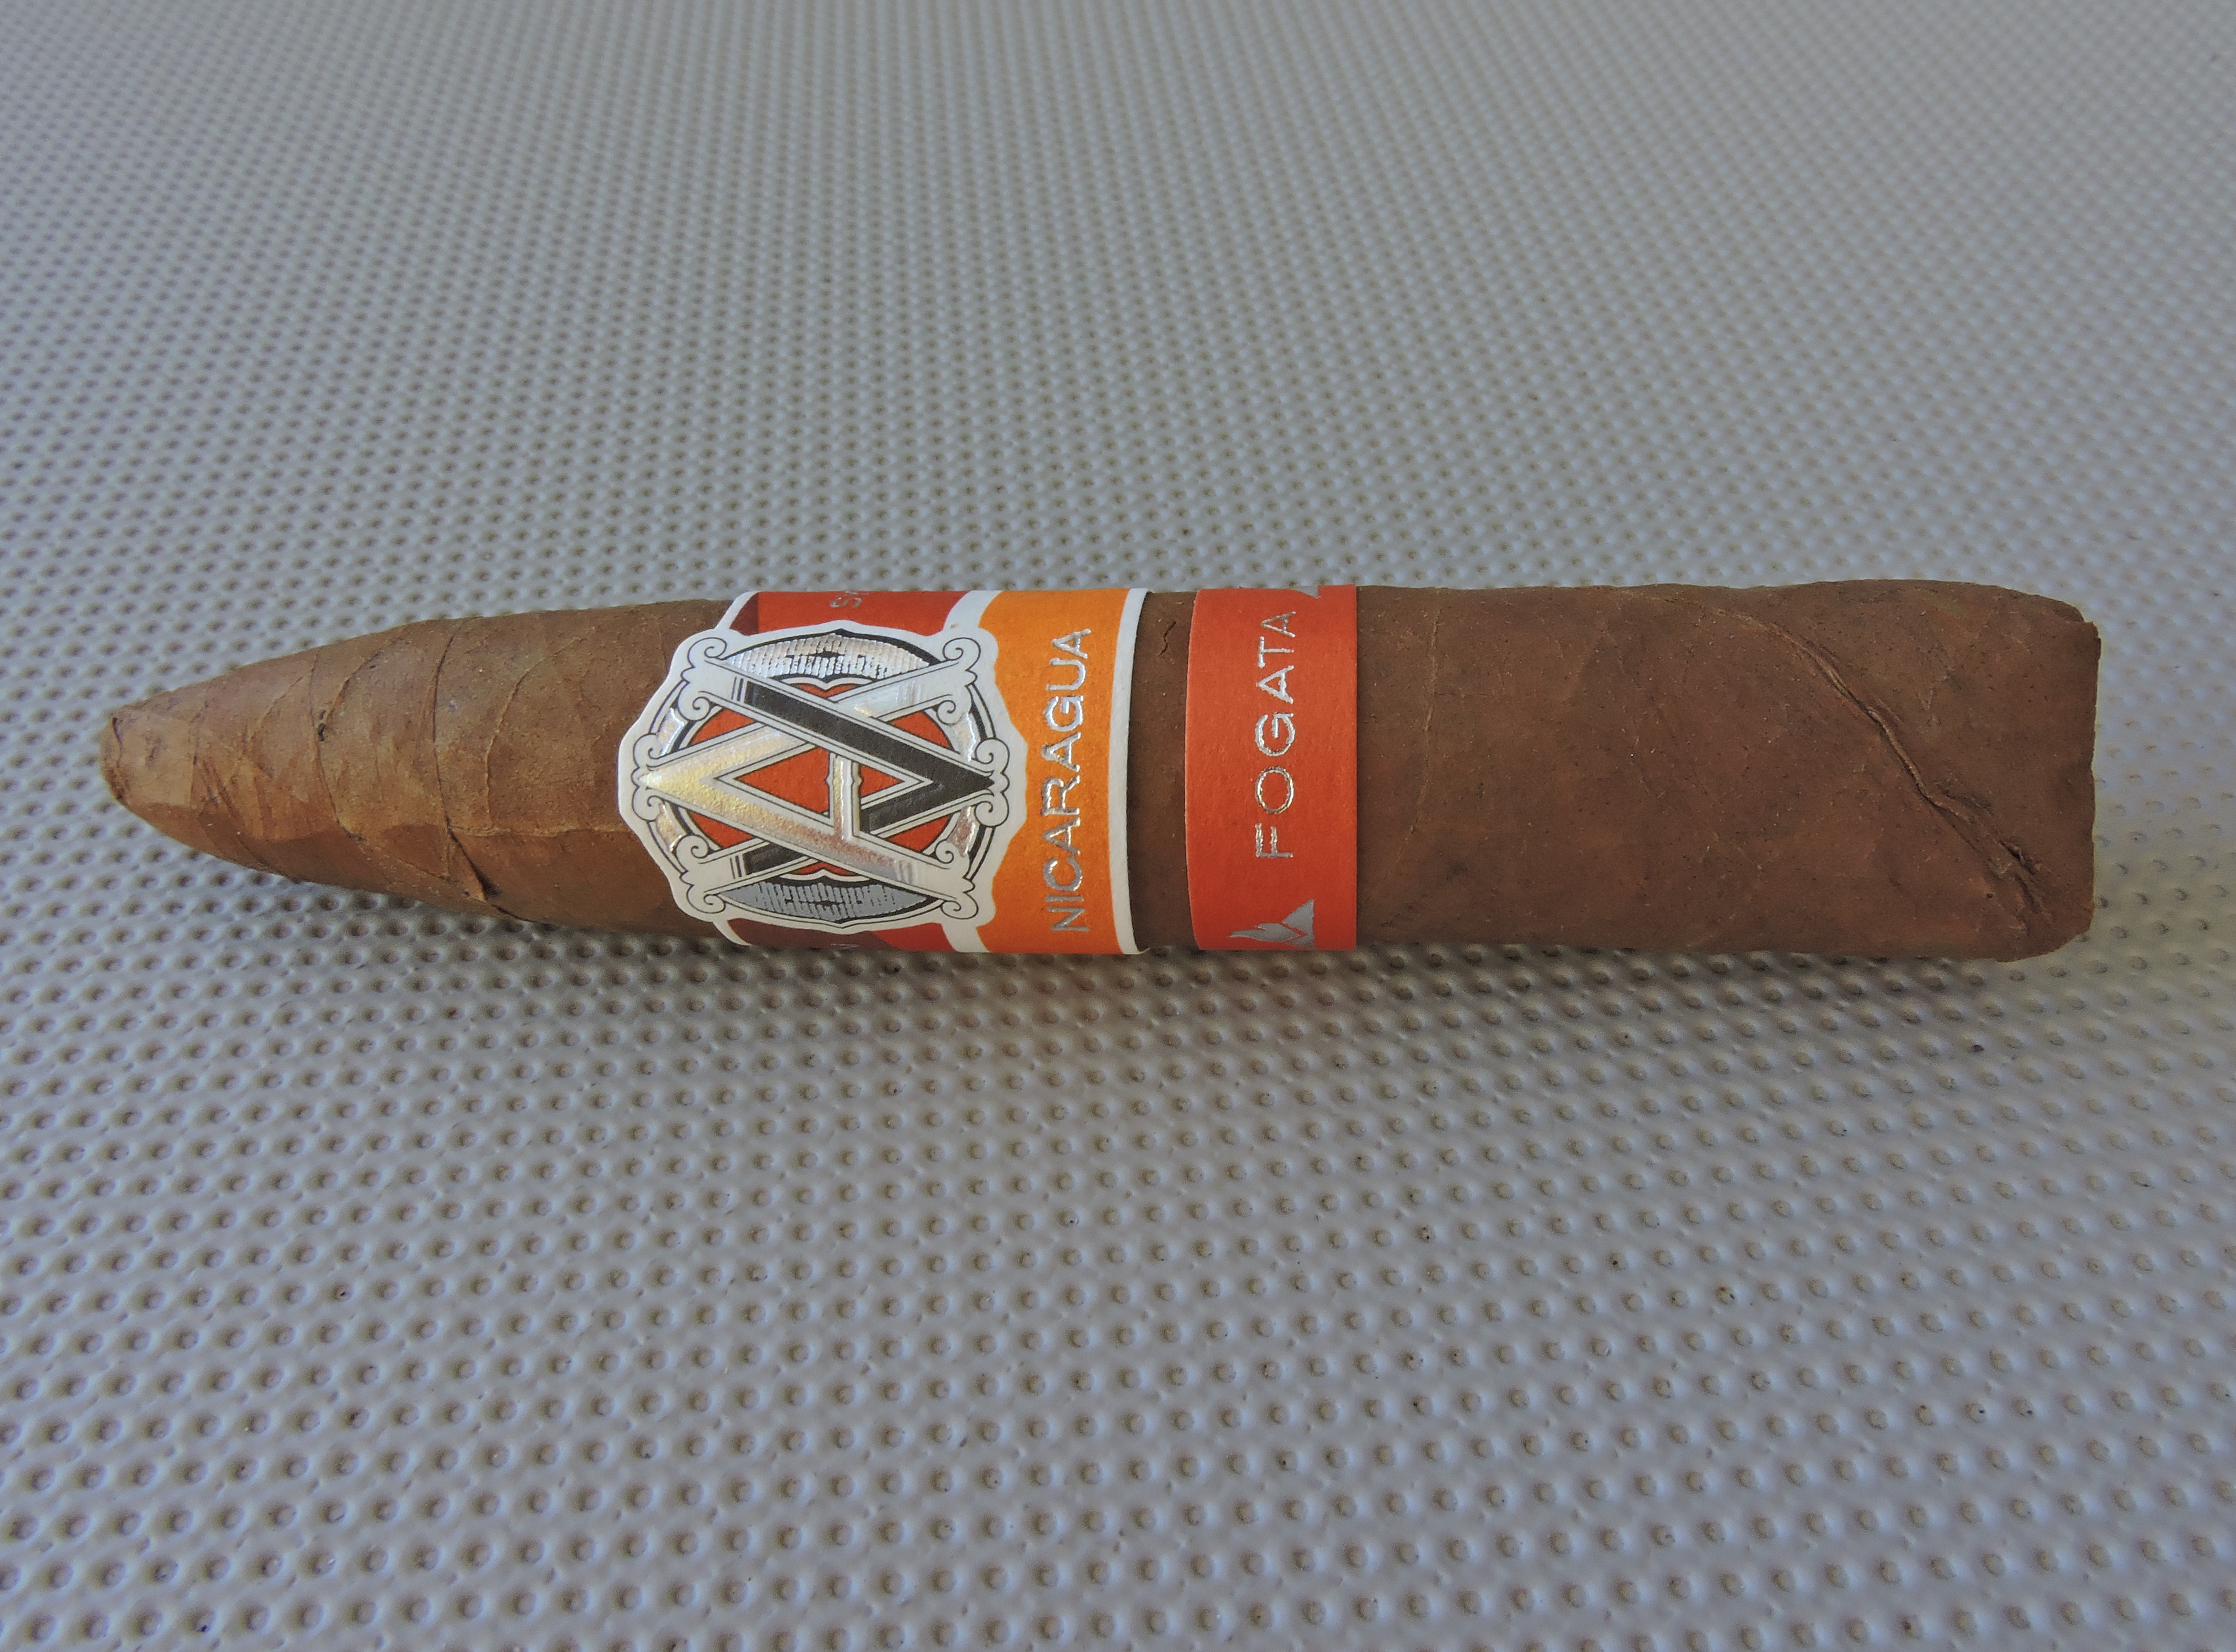 Cigar Review: Avo Syncro Nicaragua Fogata Short Torpedo